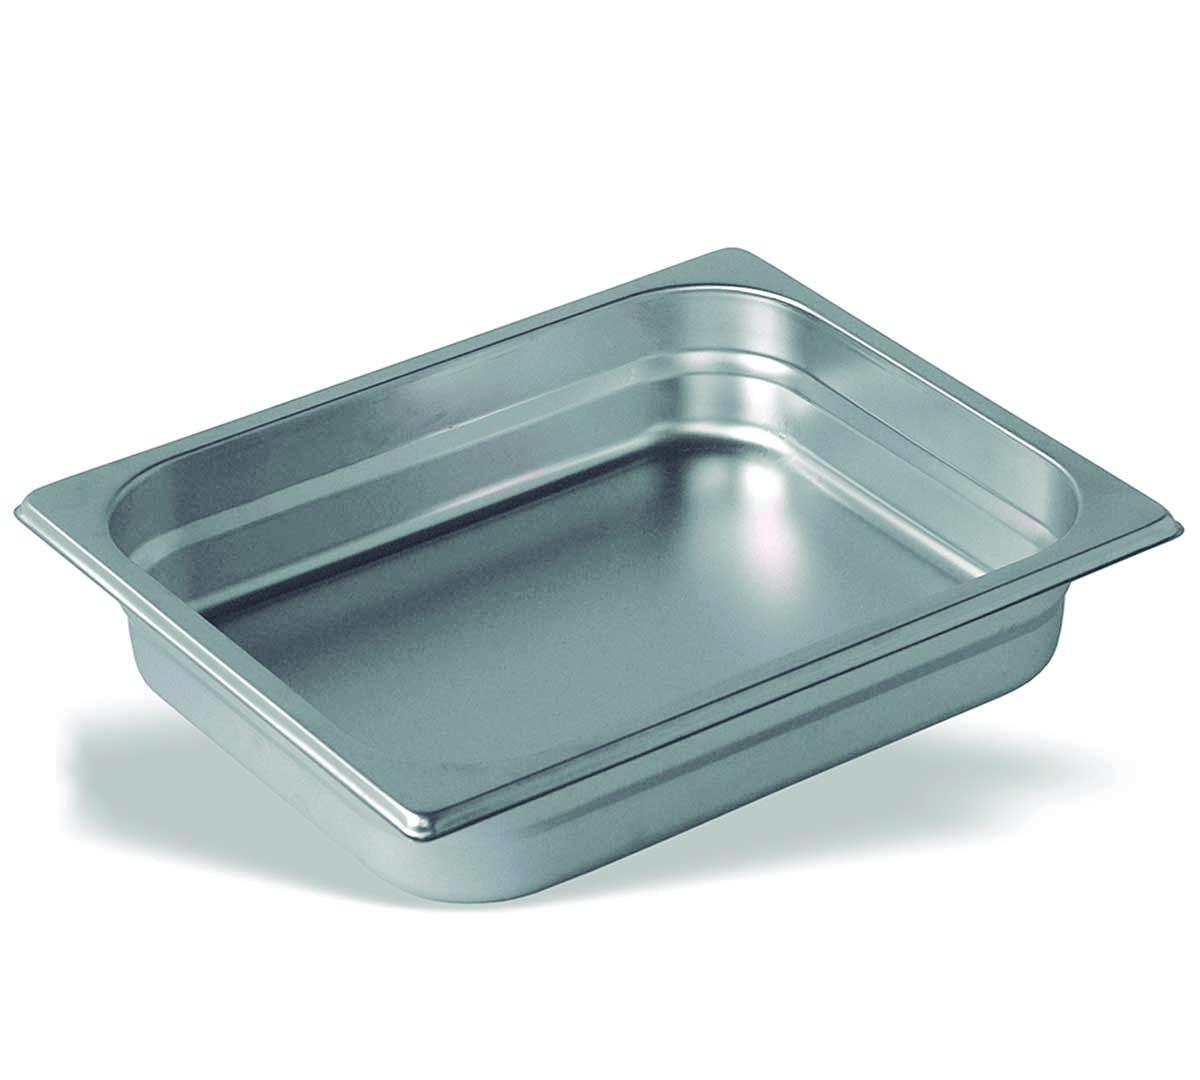 Cubeta Gastronorm 325x265 mm